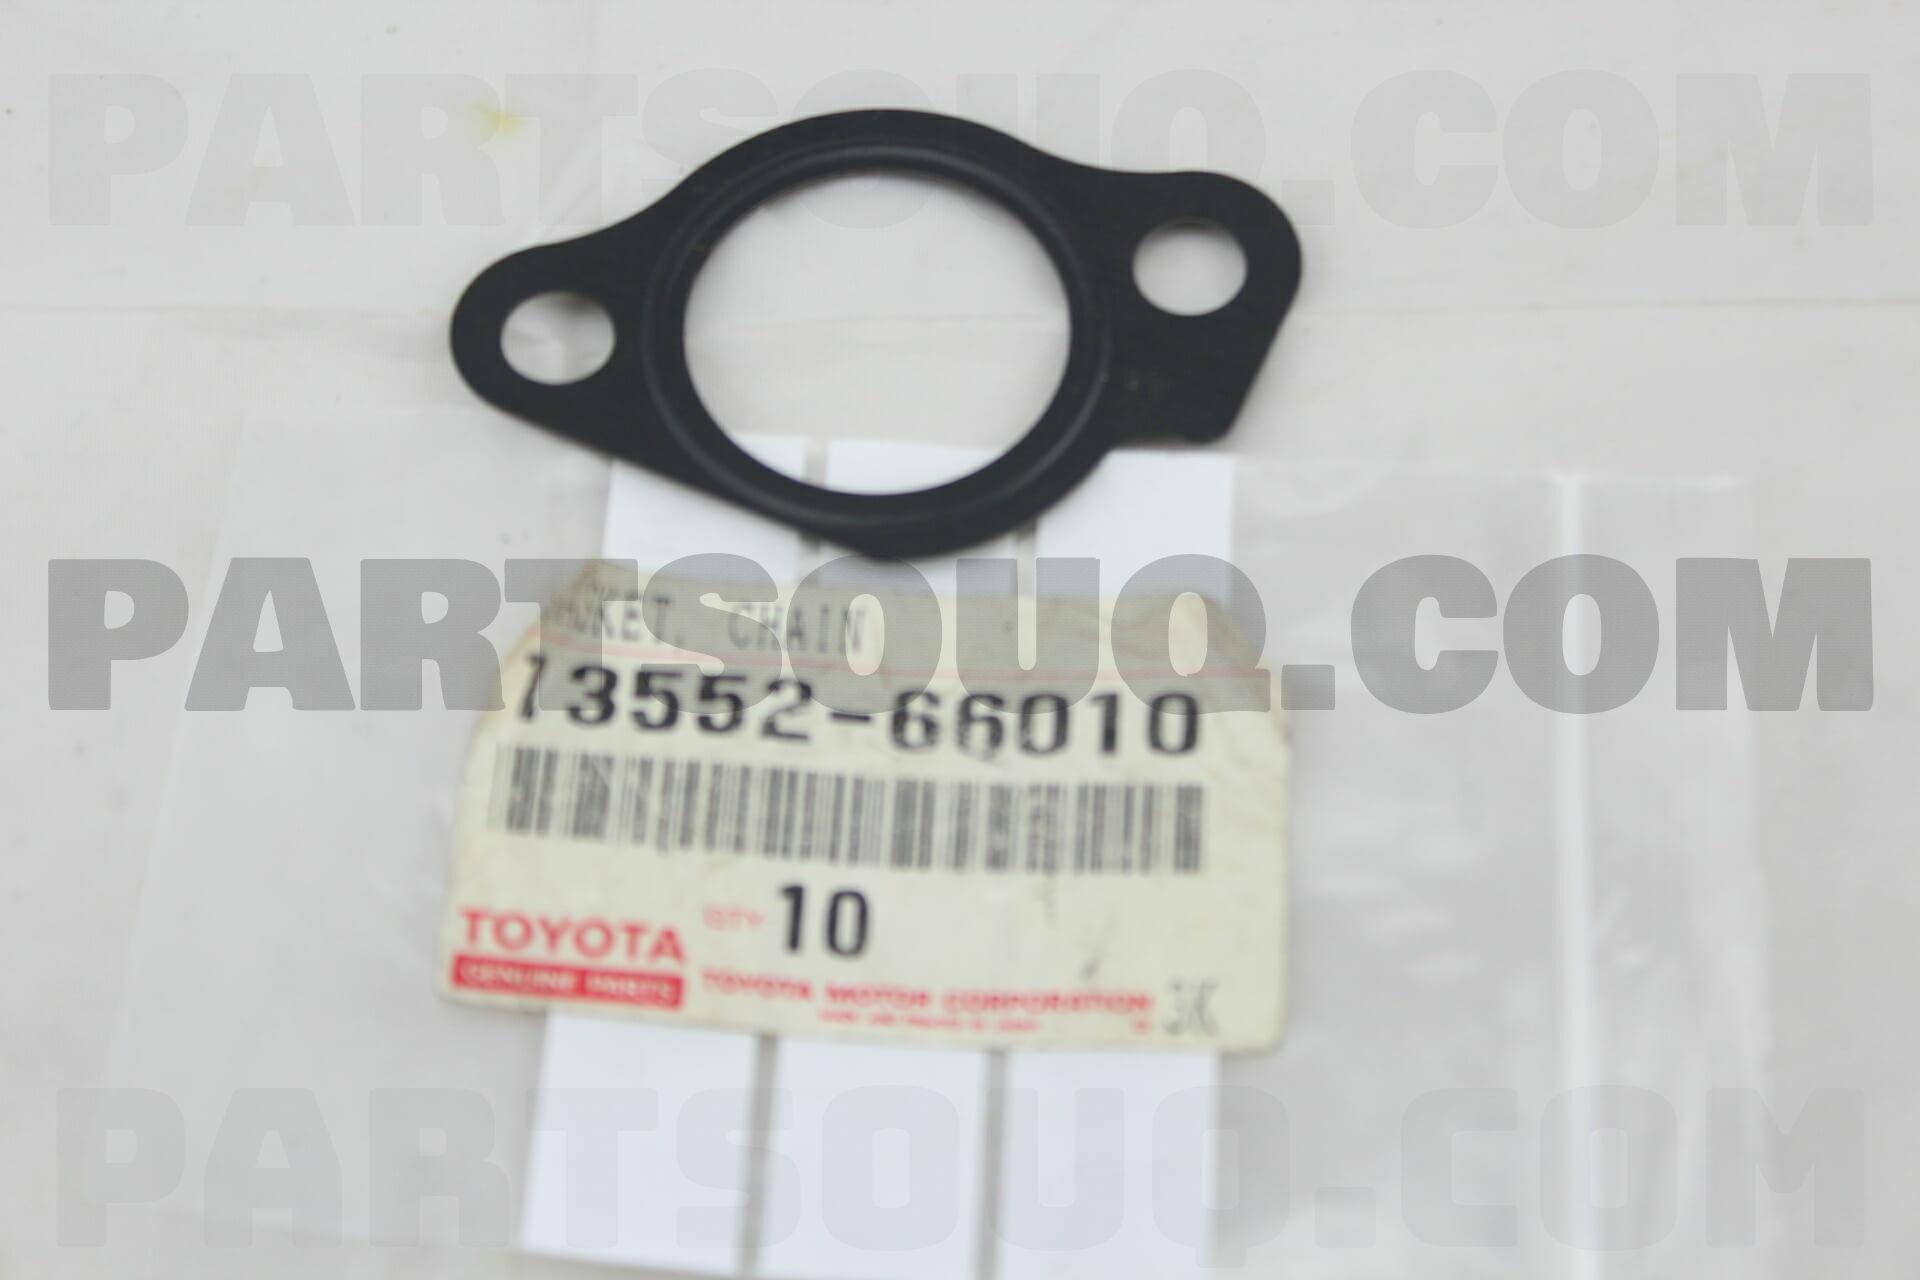 Genuine Toyota Gasket Chain Tension 13552-66010